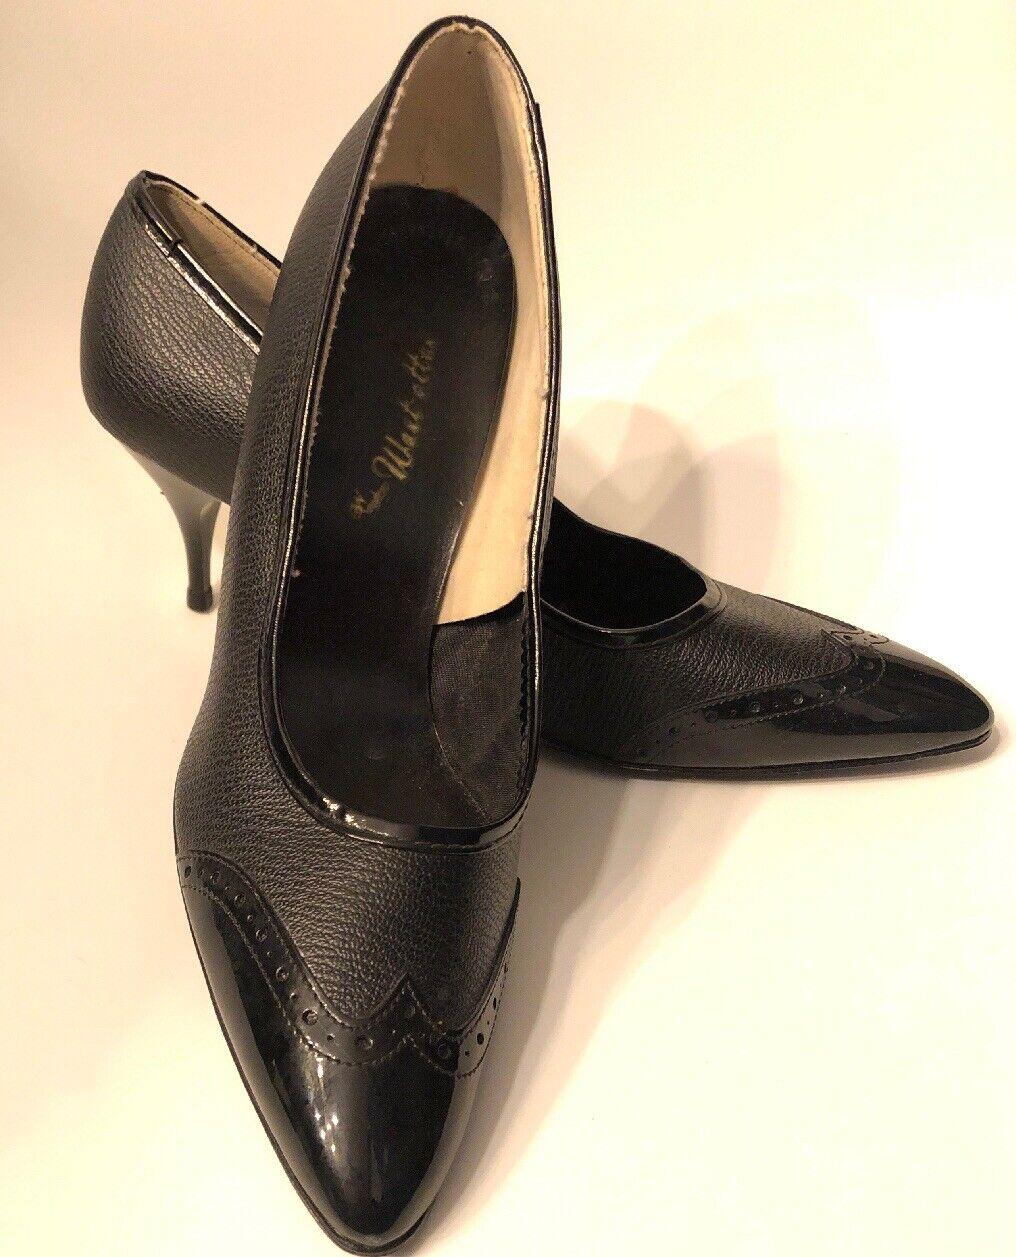 risparmia il 60% di sconto Vintage West-ettes 9.5 Medium Medium Medium nero Heels Pumps Wingtips Patent Pebbeled Pointy  l'ultimo